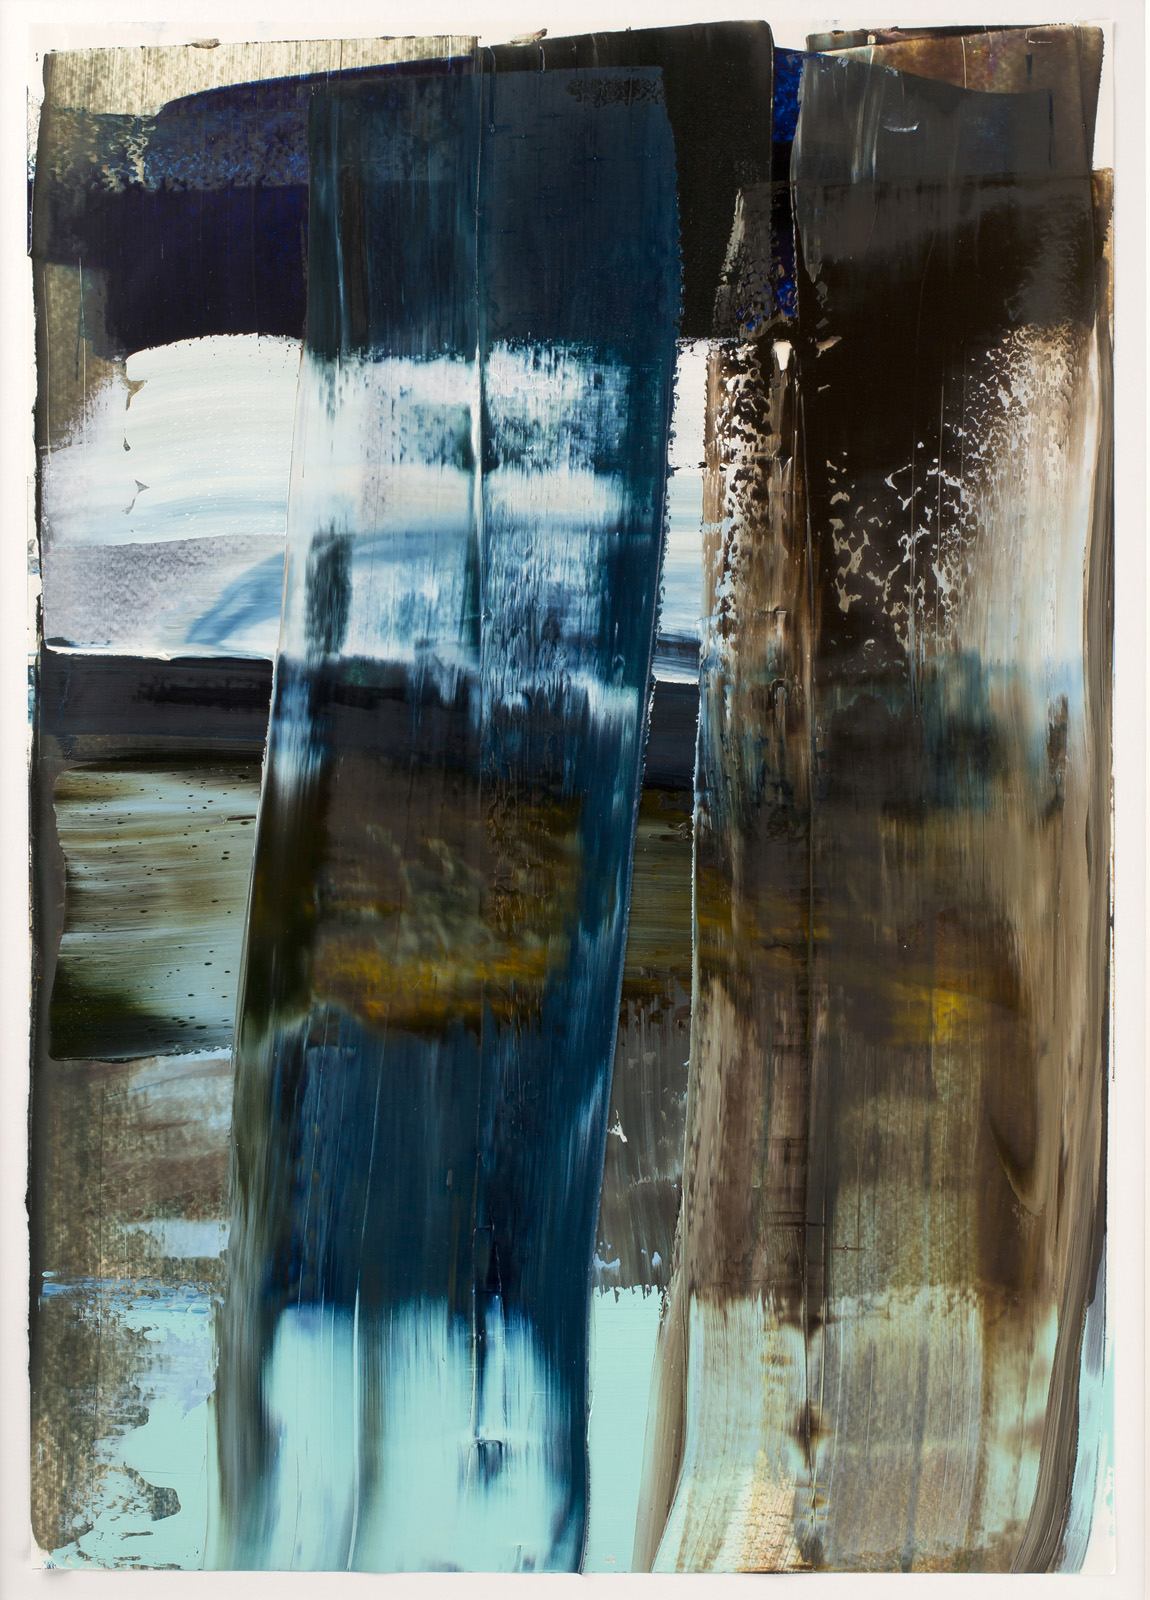 Neuland II, Öl auf Papier, 51x36cm, 2016